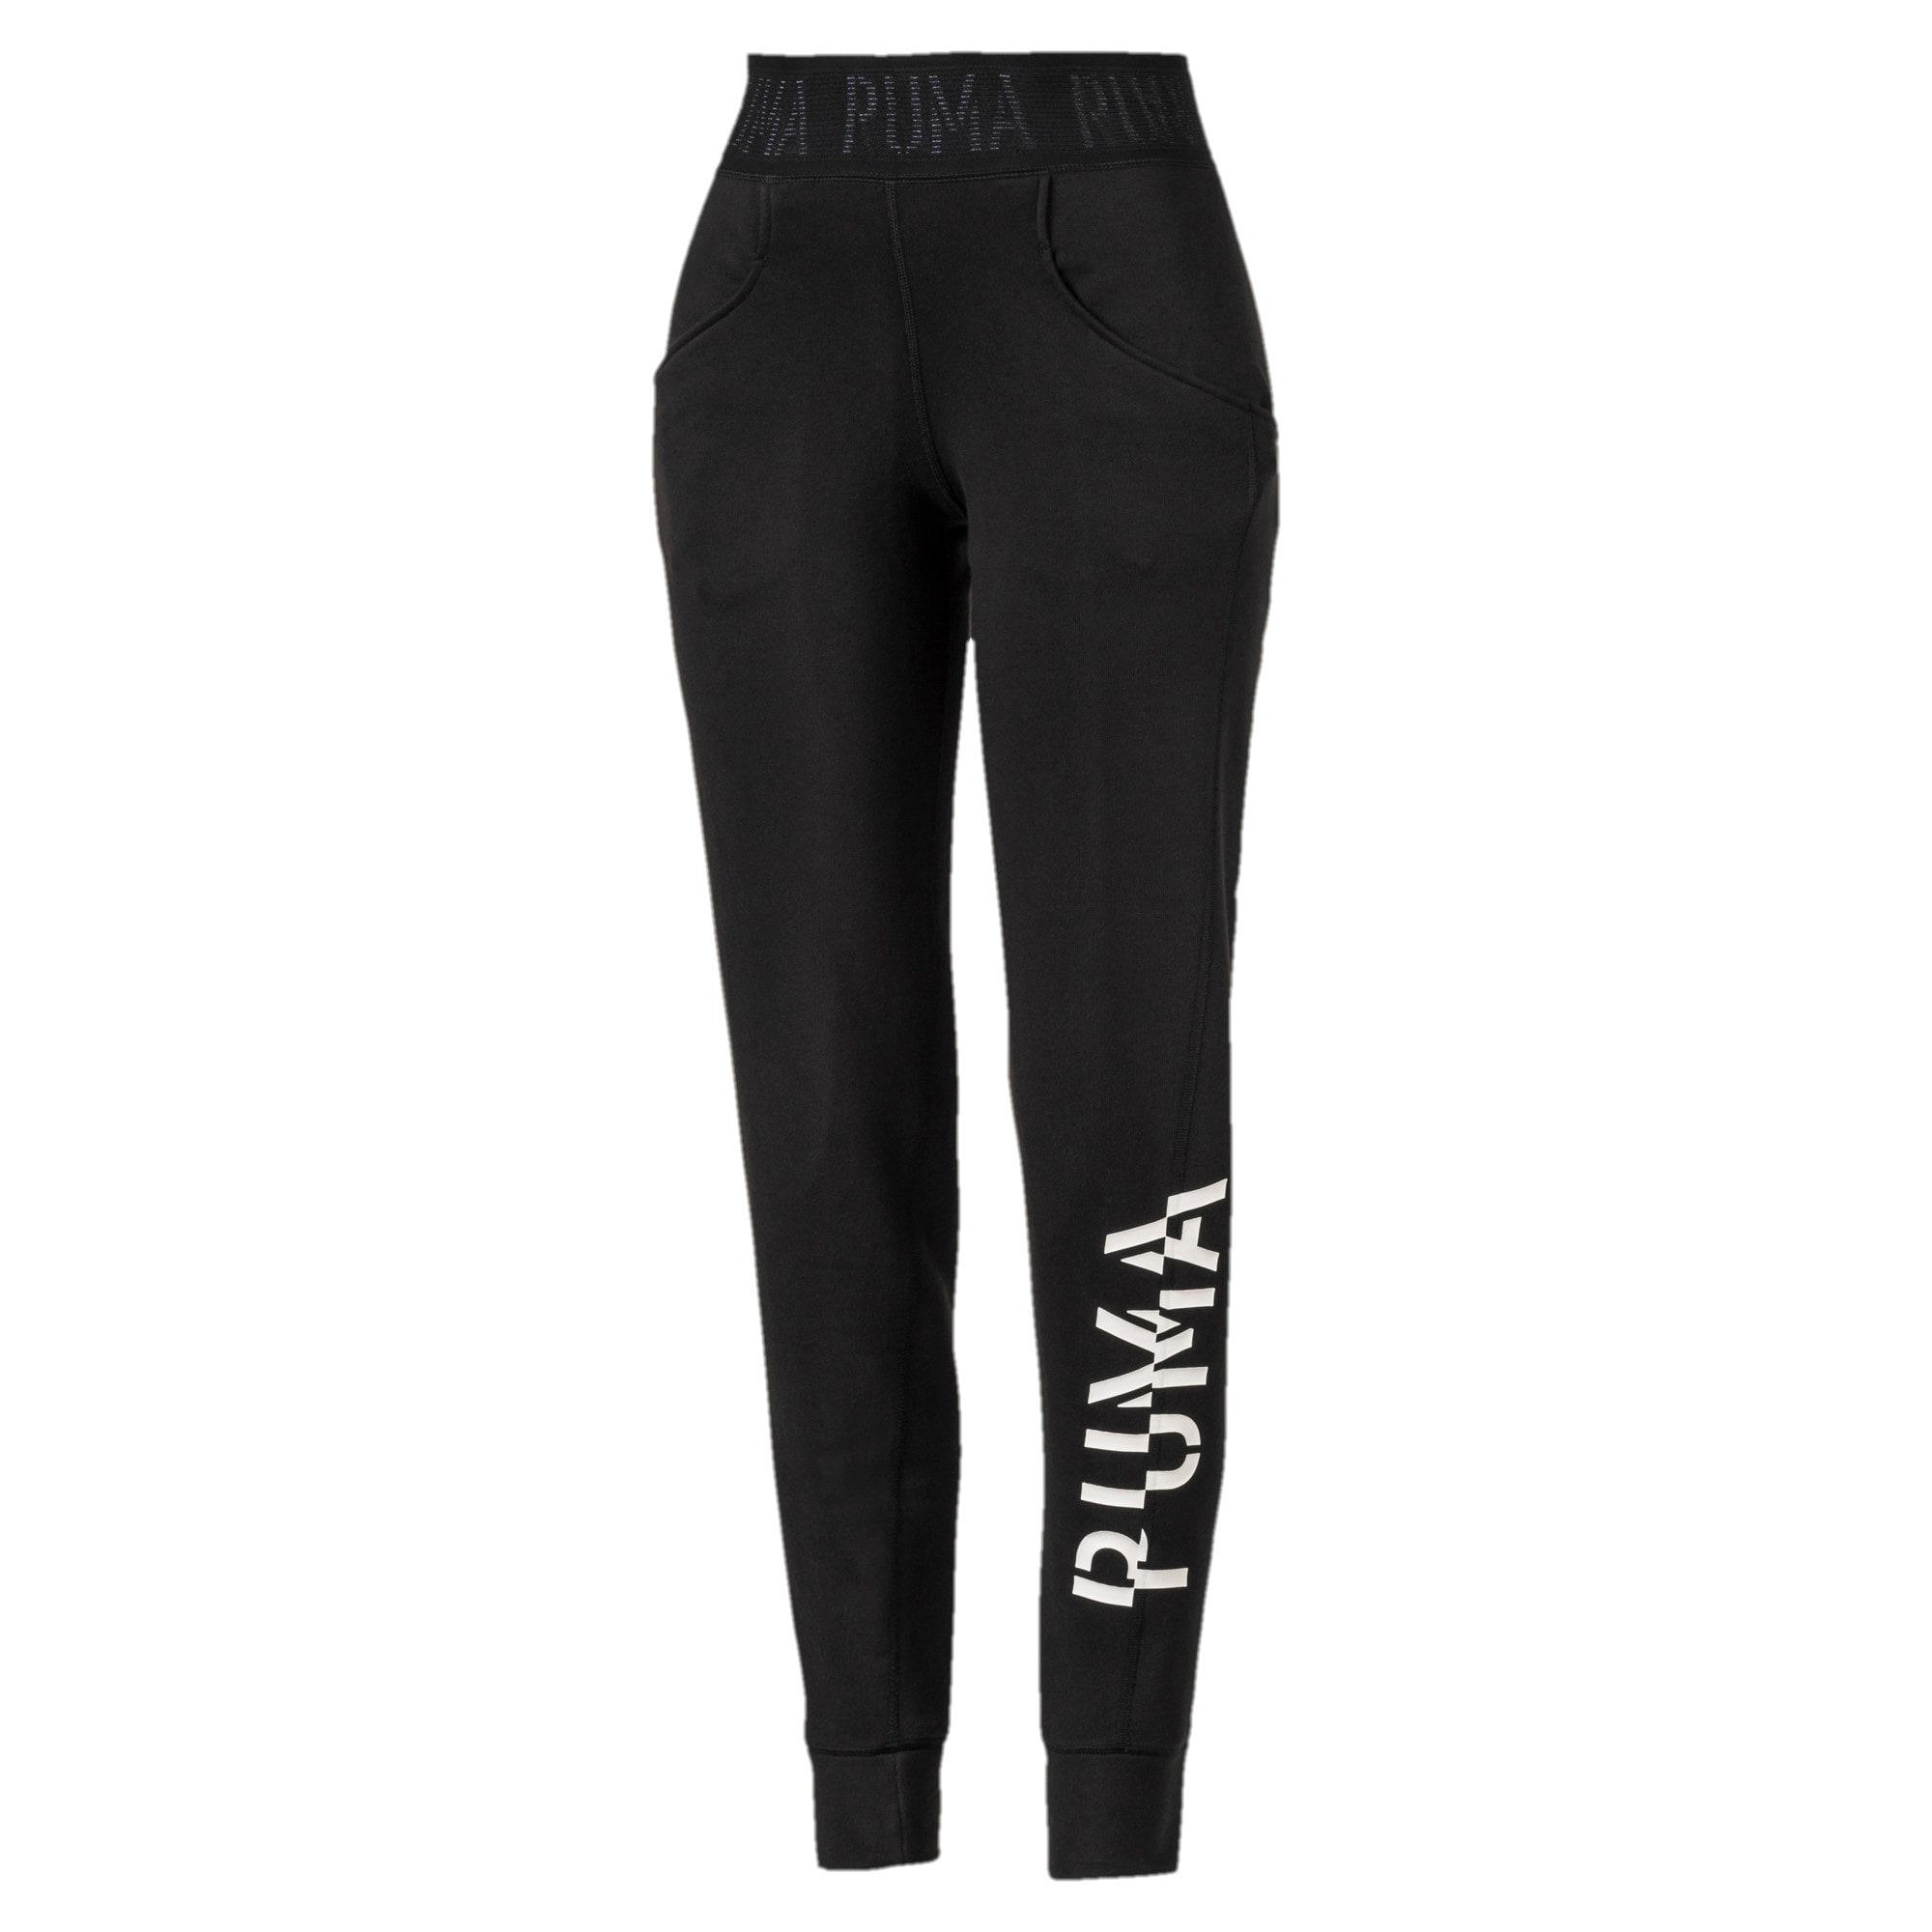 Thumbnail 4 of Logo Women's Sweatpants, Puma Black-Q3, medium